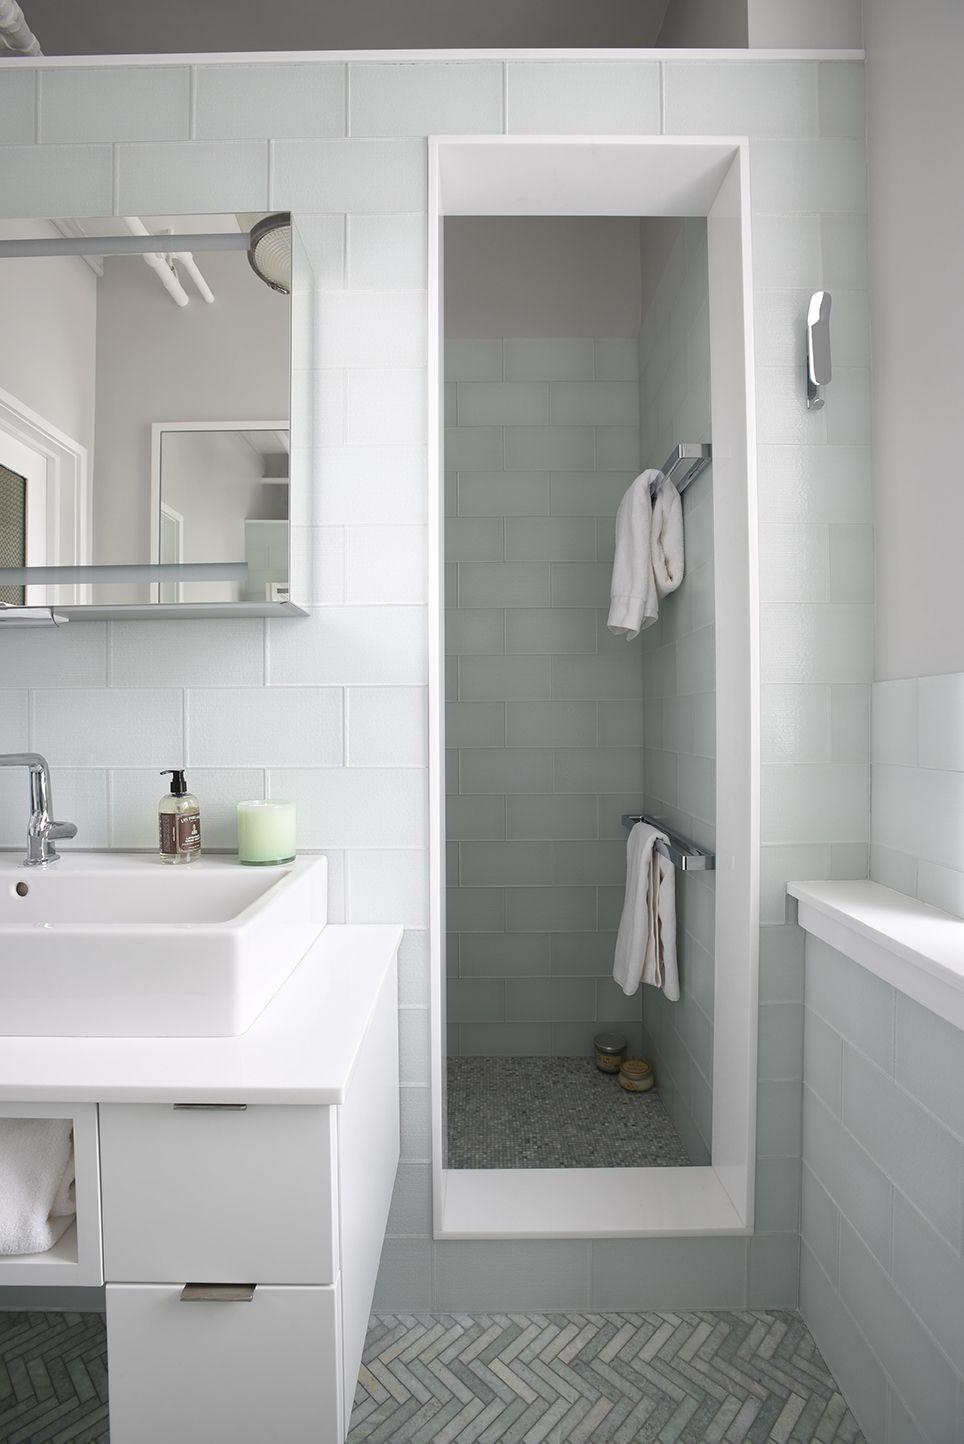 DSC_6538.jpg | Bathrooms | Pinterest | Lofts, Master bathrooms and ...